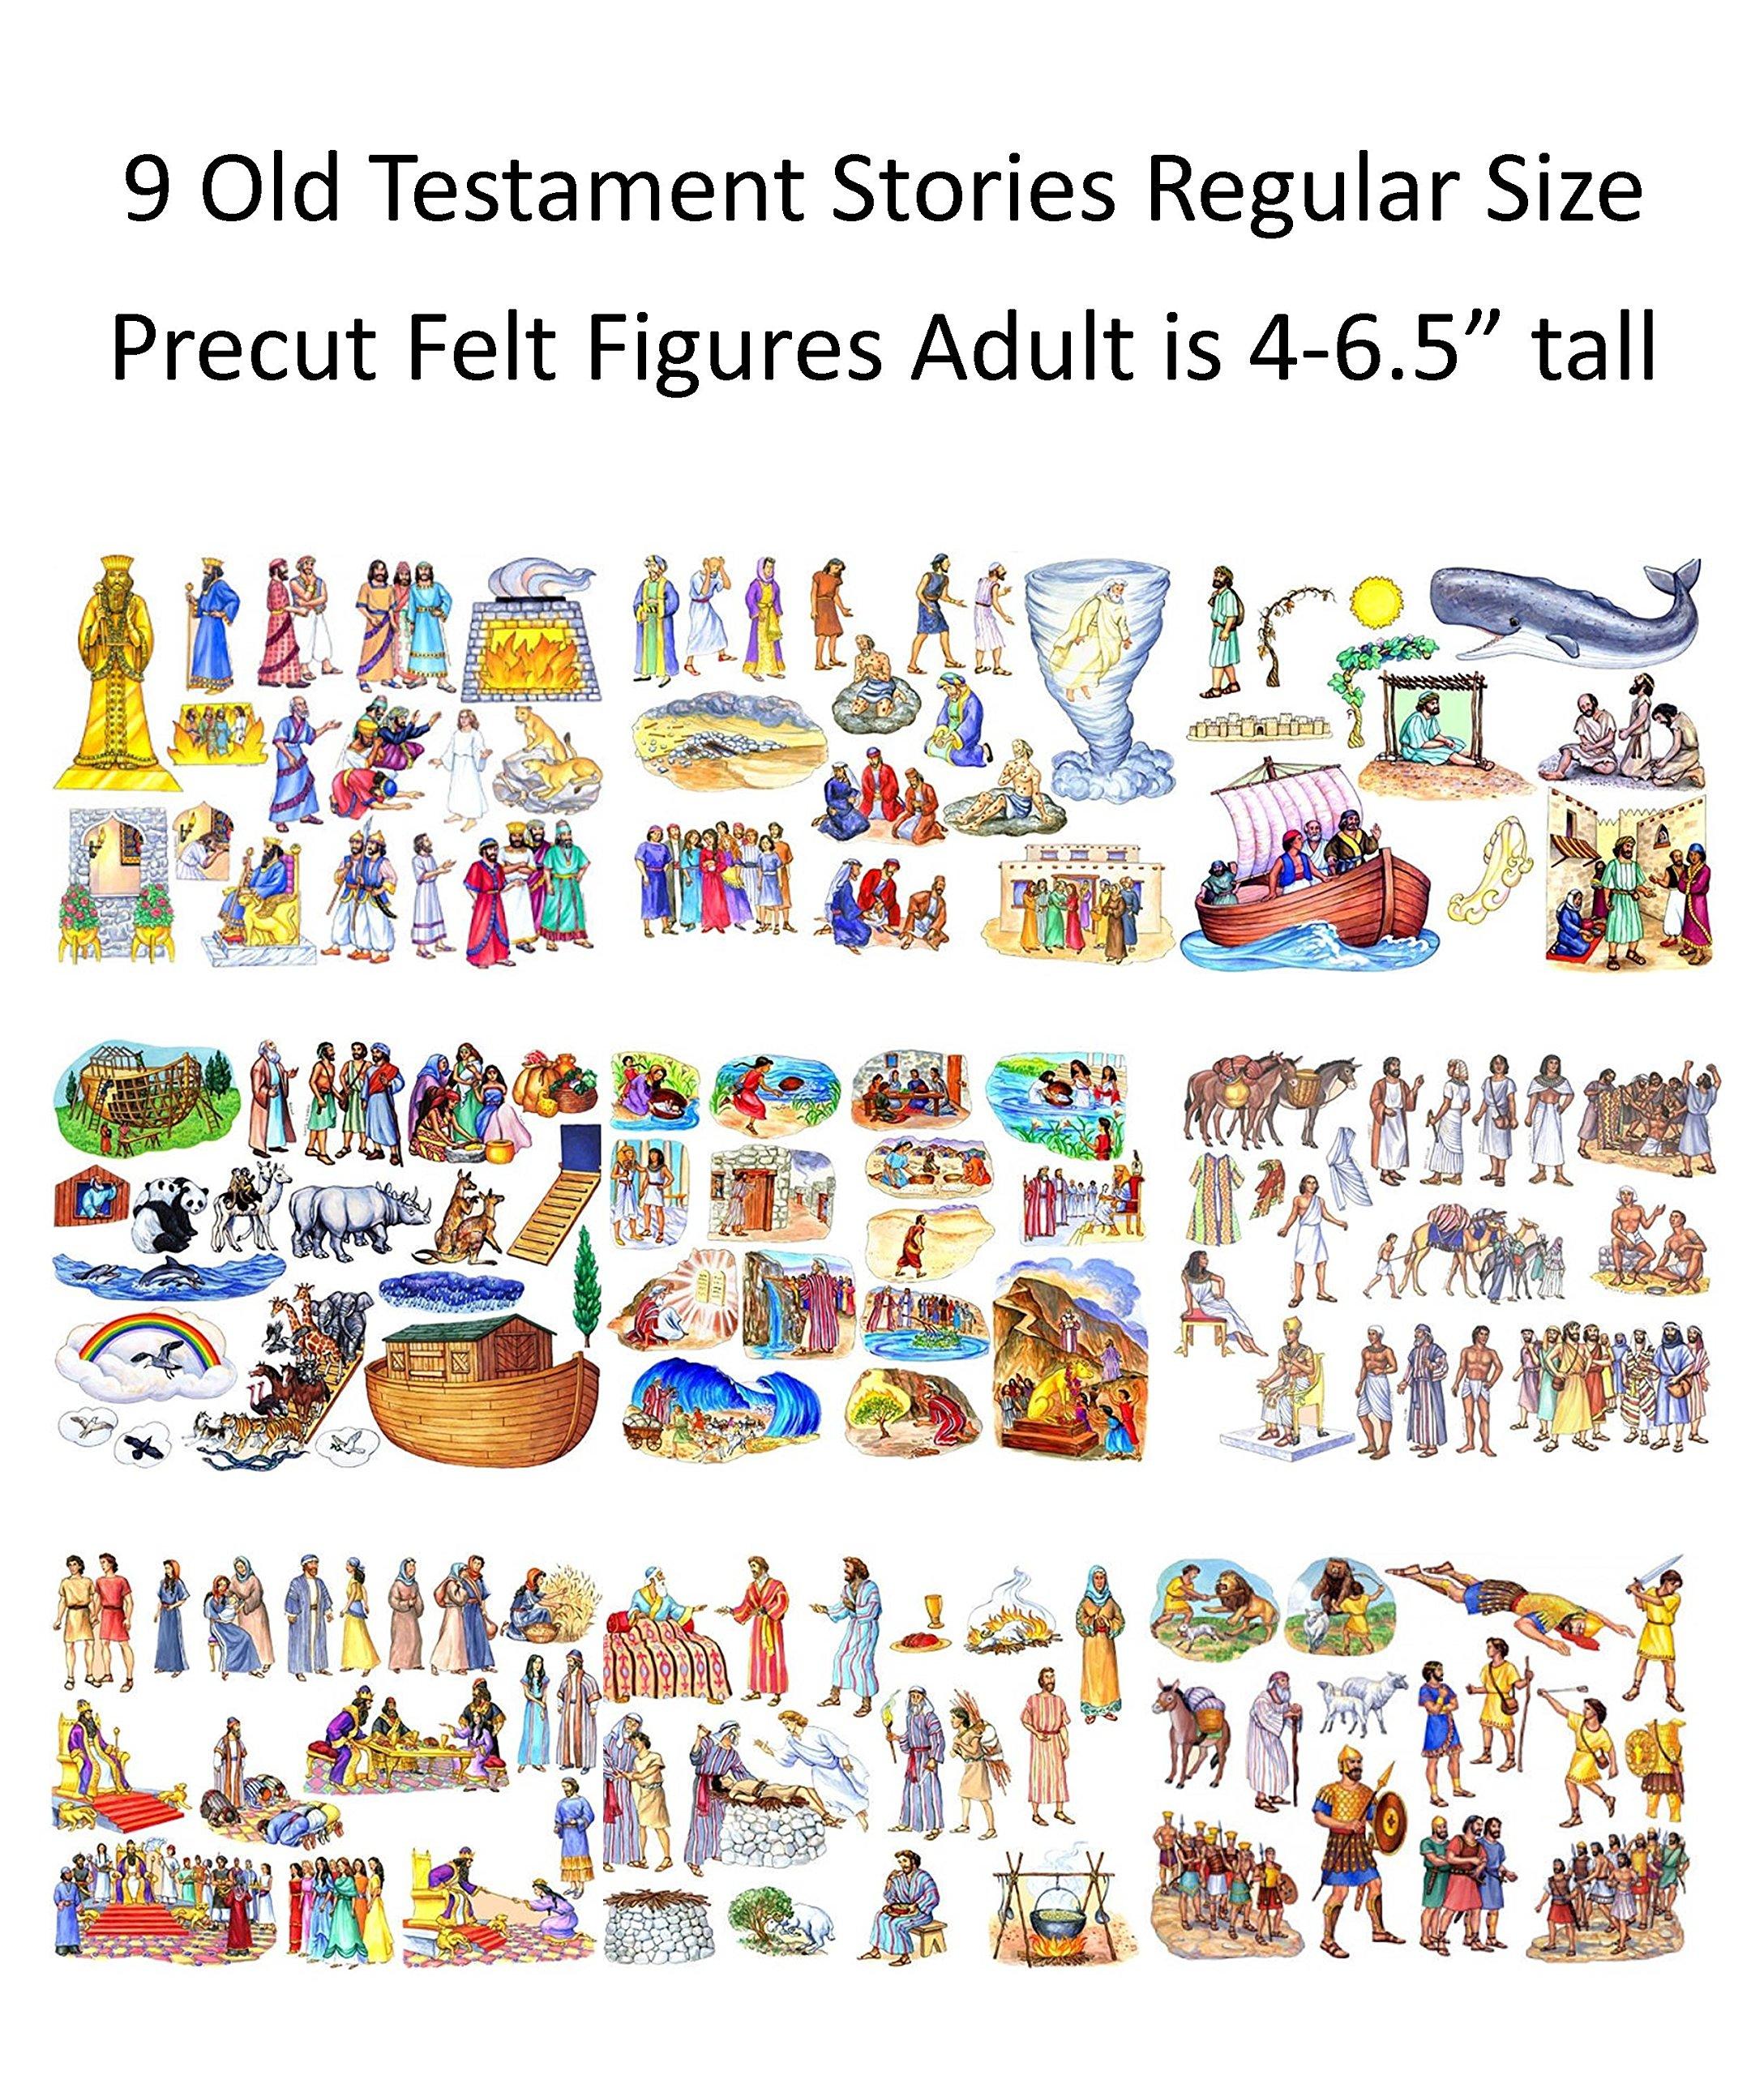 9 Old Testament Bible Stories Precut Felt Figures for Flannel Board Noah, David, Daniel, Job, Jonah, Joseph, Abraham, Ruth Esther, Moses